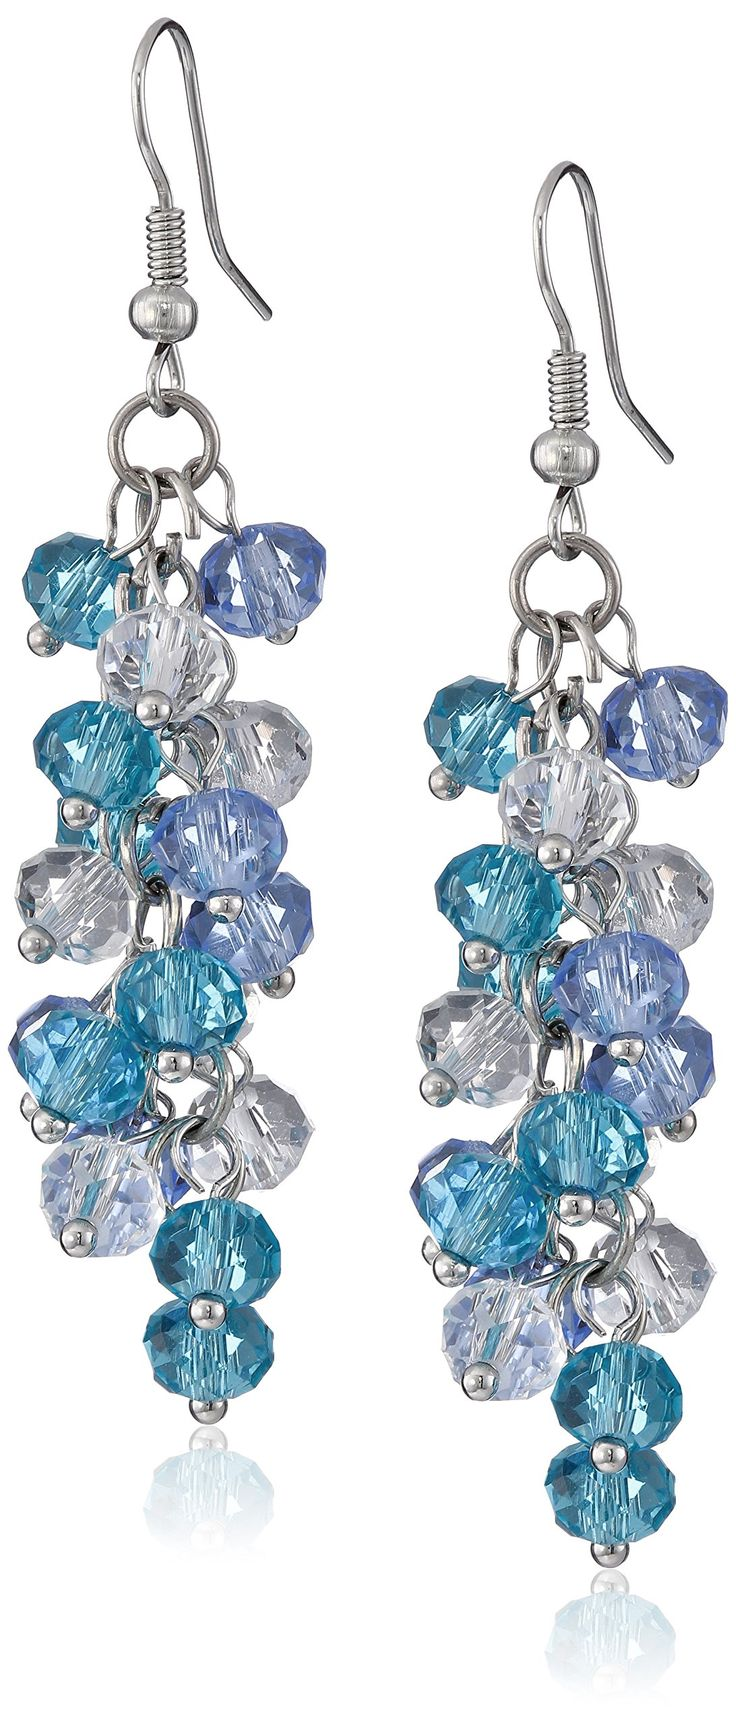 "Ocean Blue Cluster Faceted Crystal Dangle Hook Earrings For Women 2"":"